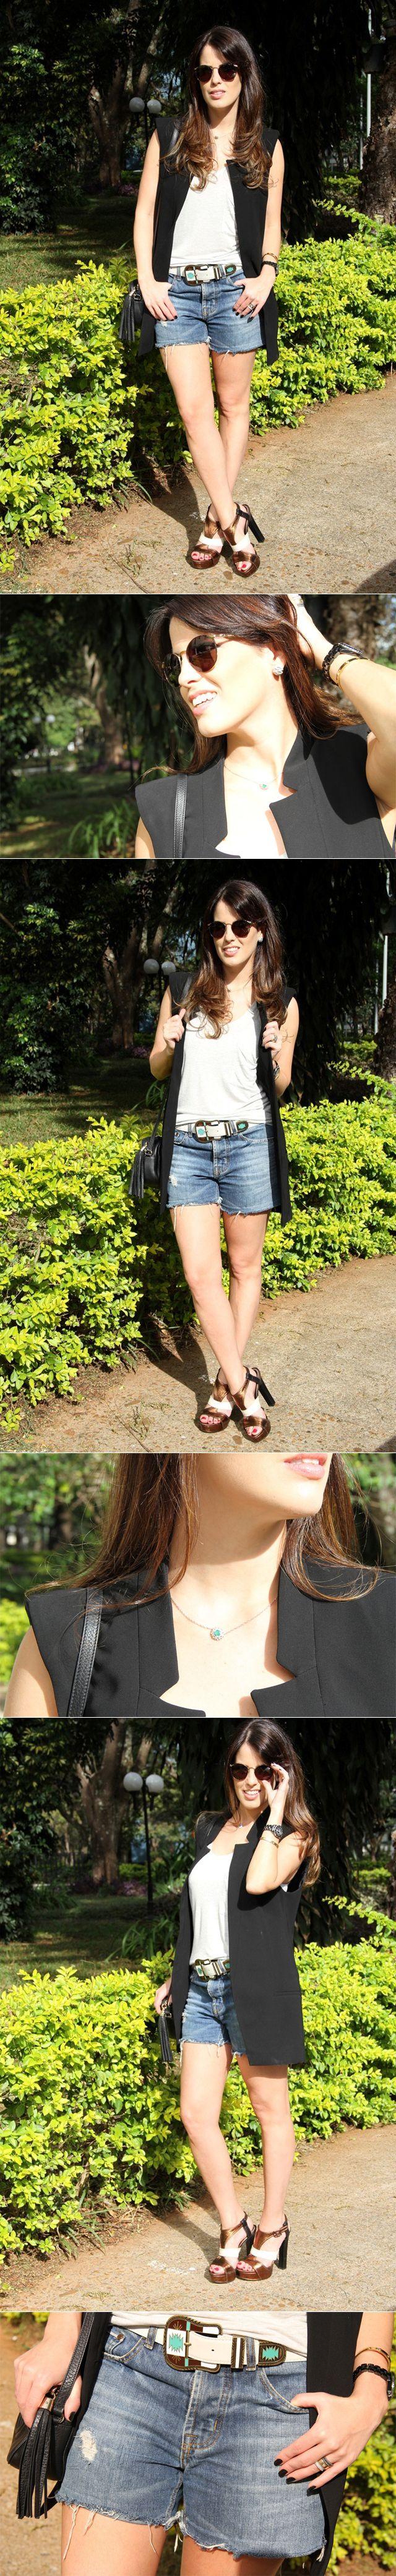 Colete de alfaiataria com shorts jeans